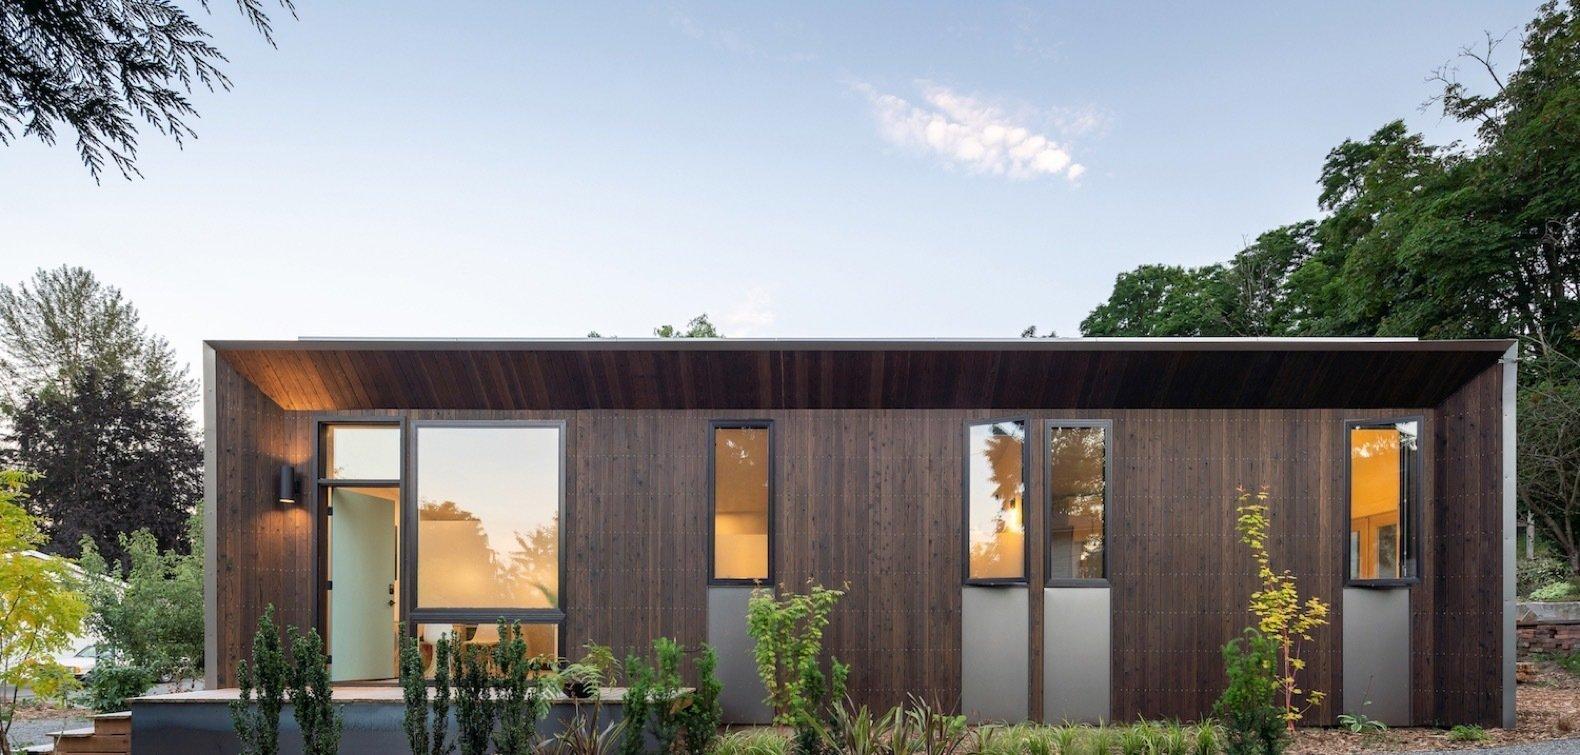 Prefab Home Companies In Seattle Washington Dwell